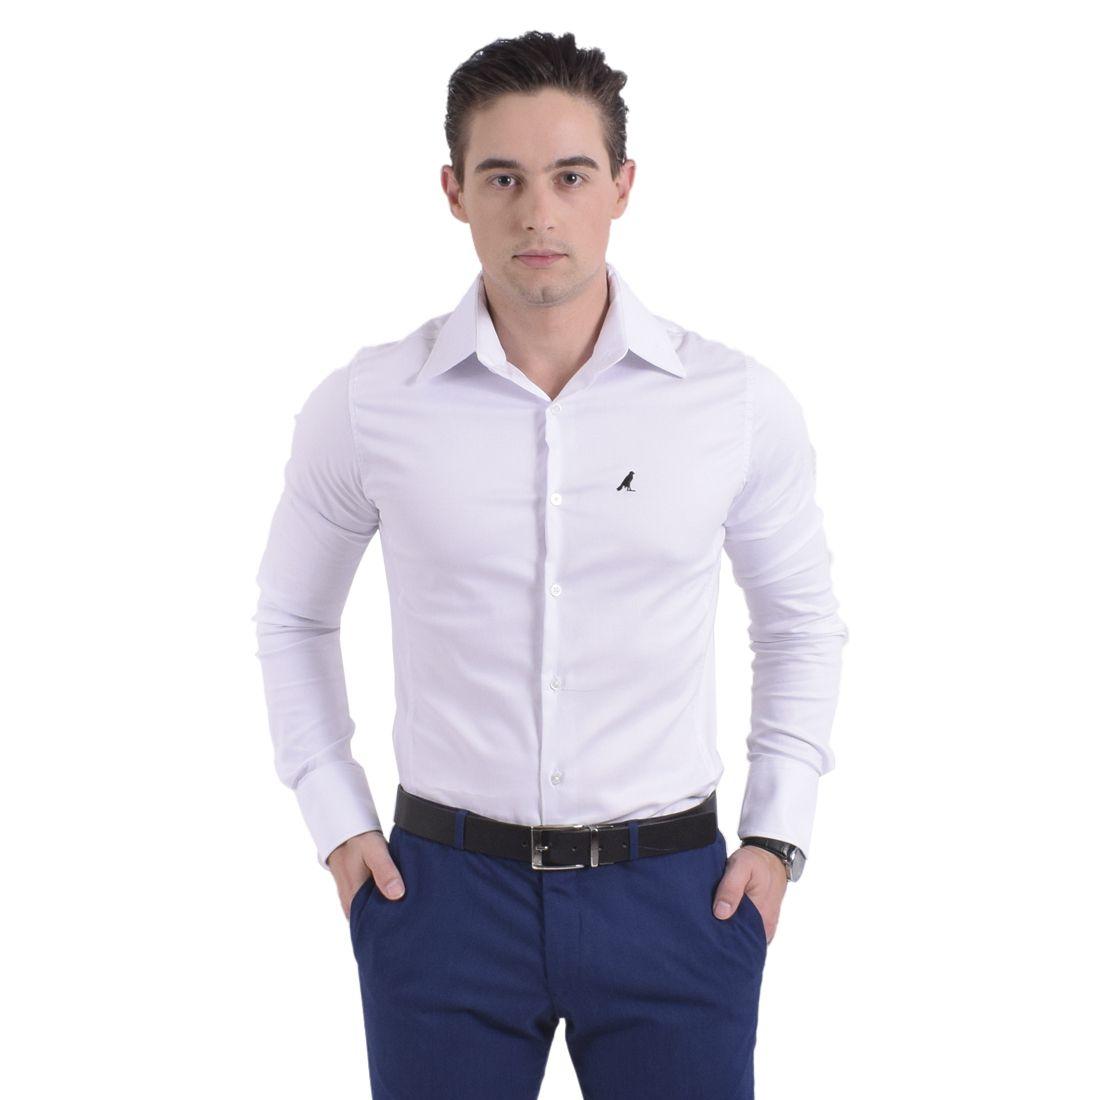 Camisa Social Branca  Masculina  Super Slim